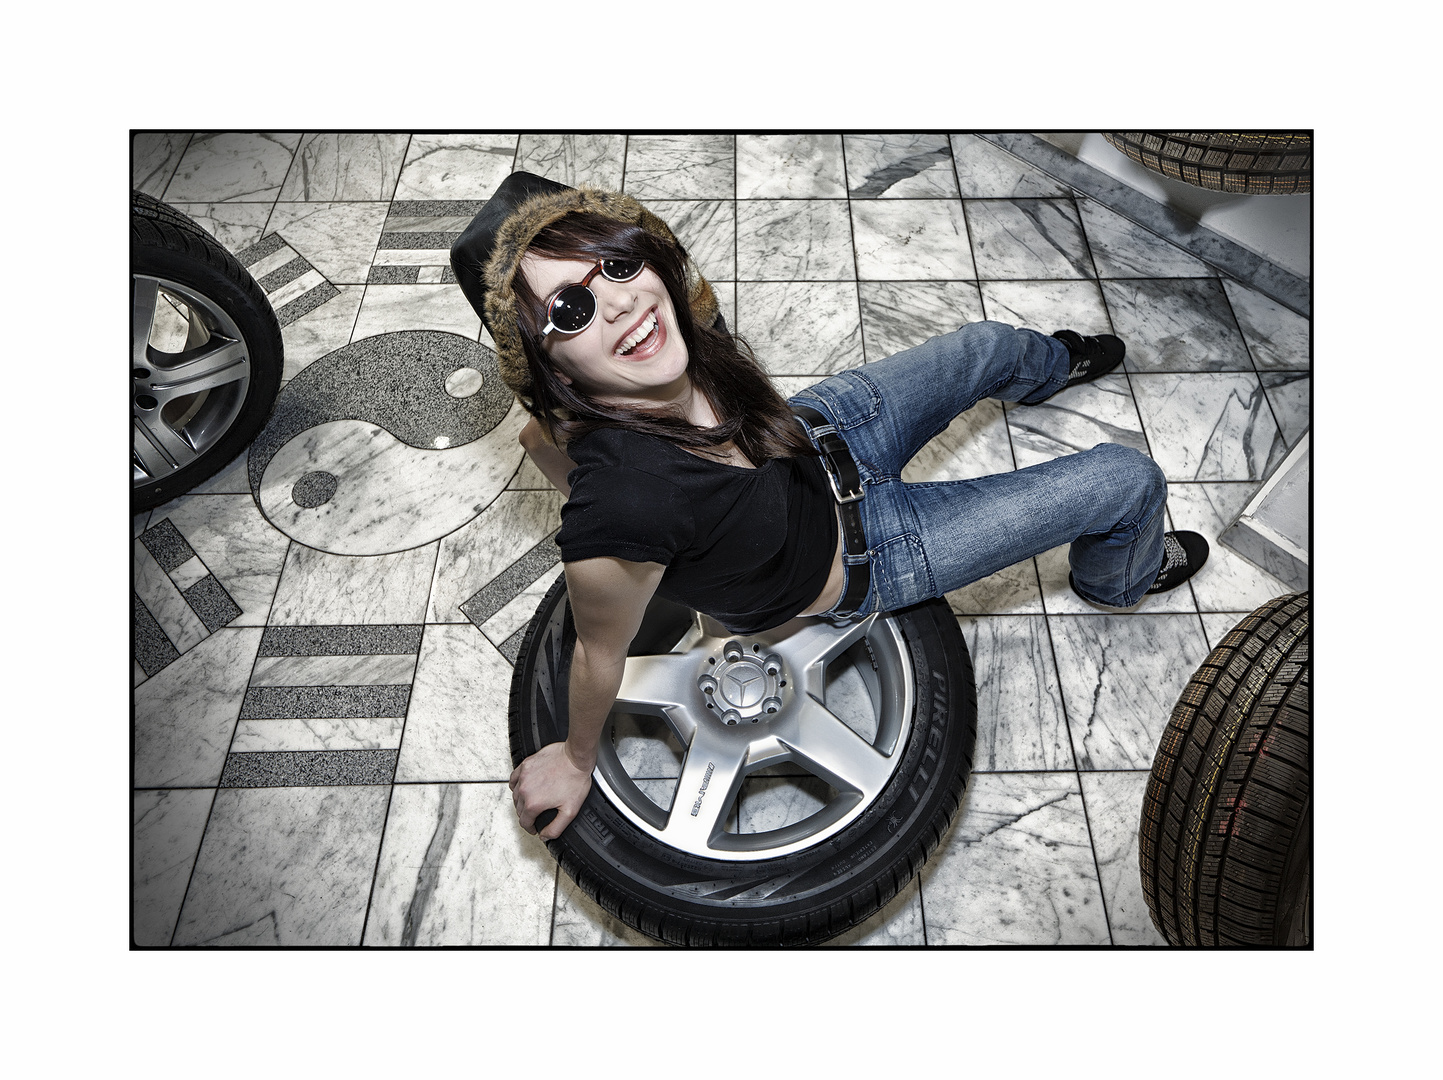 charmanter Reifenwechsel ;)